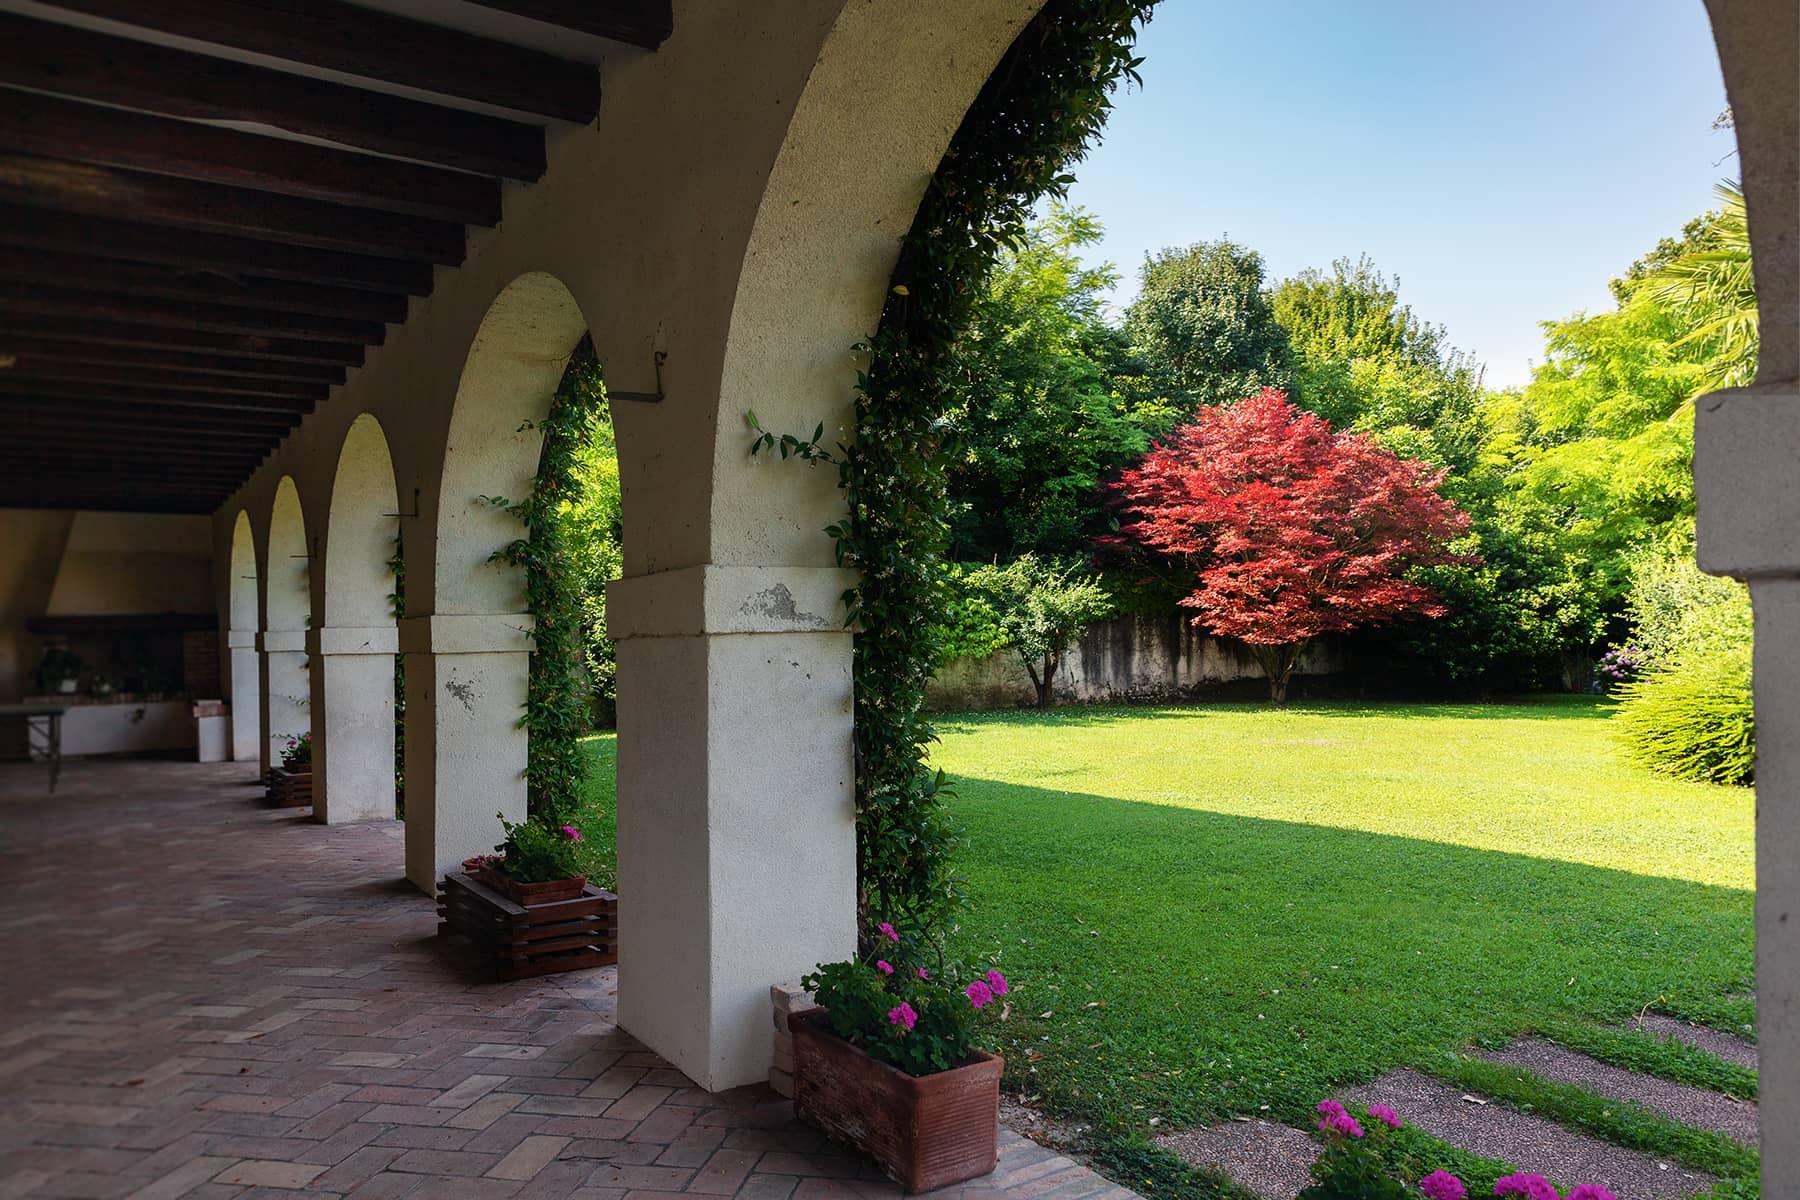 Villa in Vendita a Carbonera: 5 locali, 850 mq - Foto 5